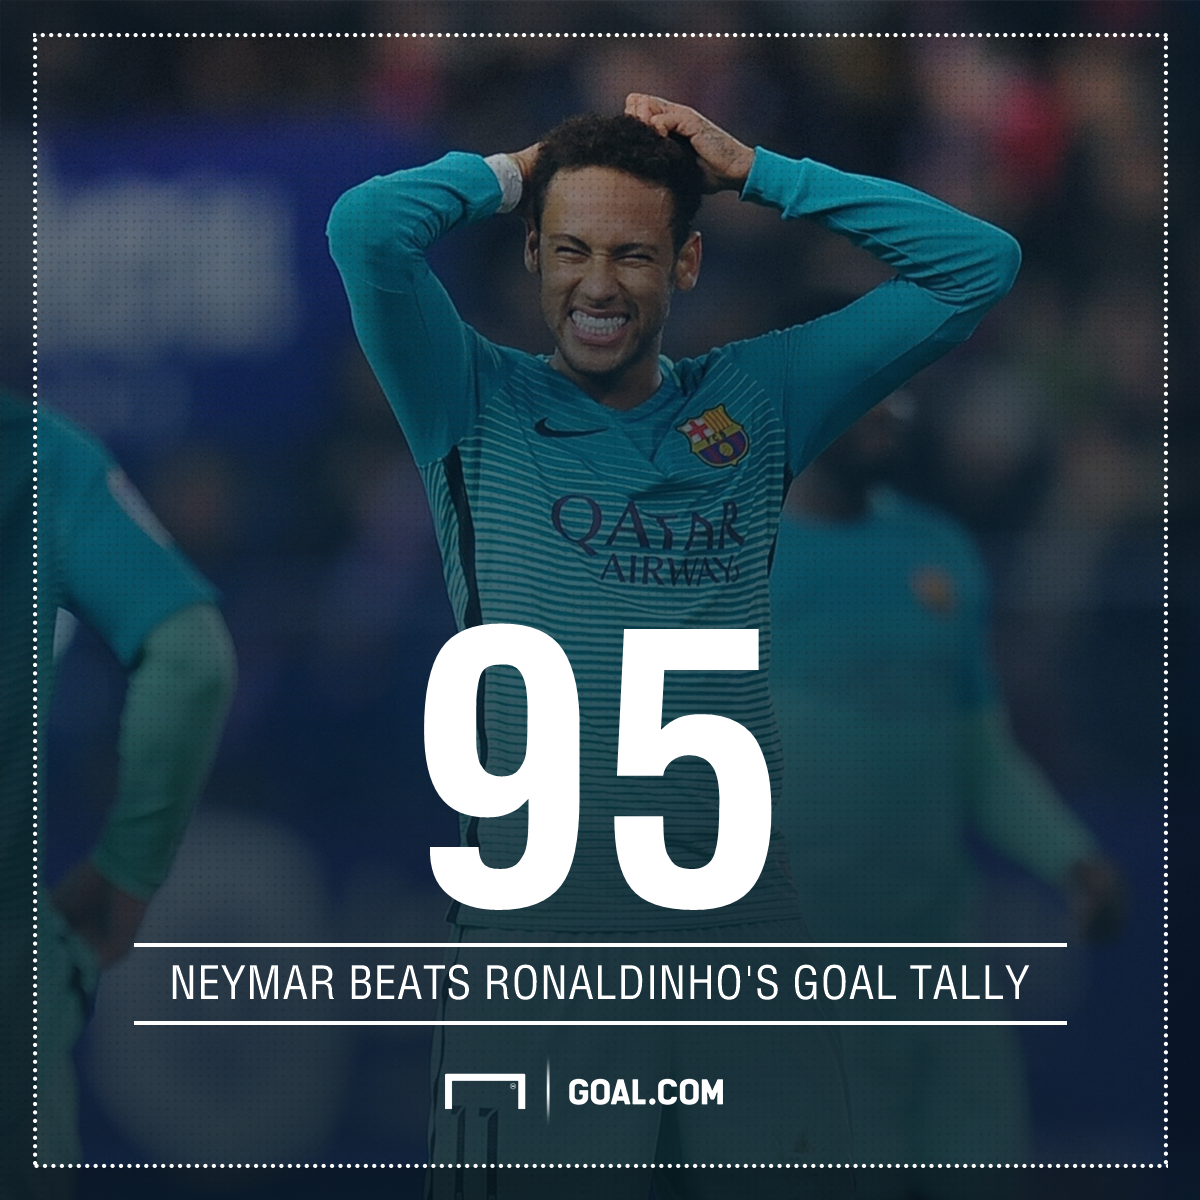 Neymar PS GFX